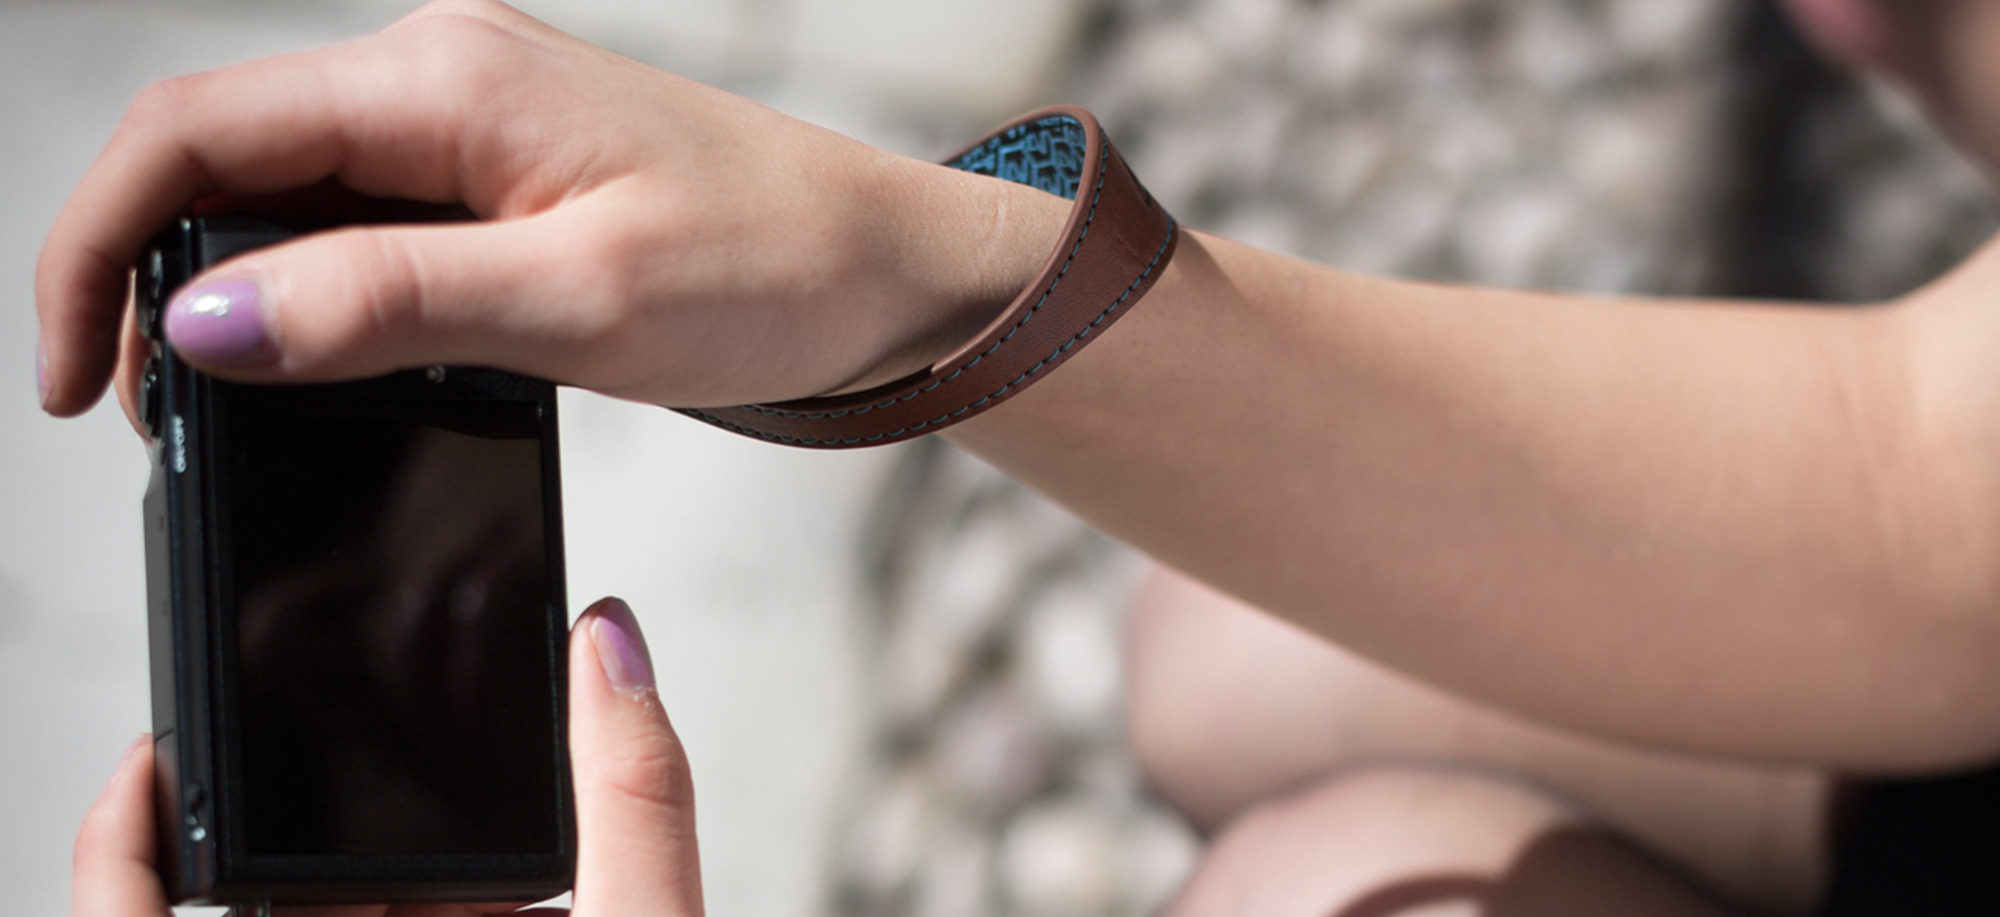 4V Design Camera Wrist Strap (WATCH) - Made in Italy